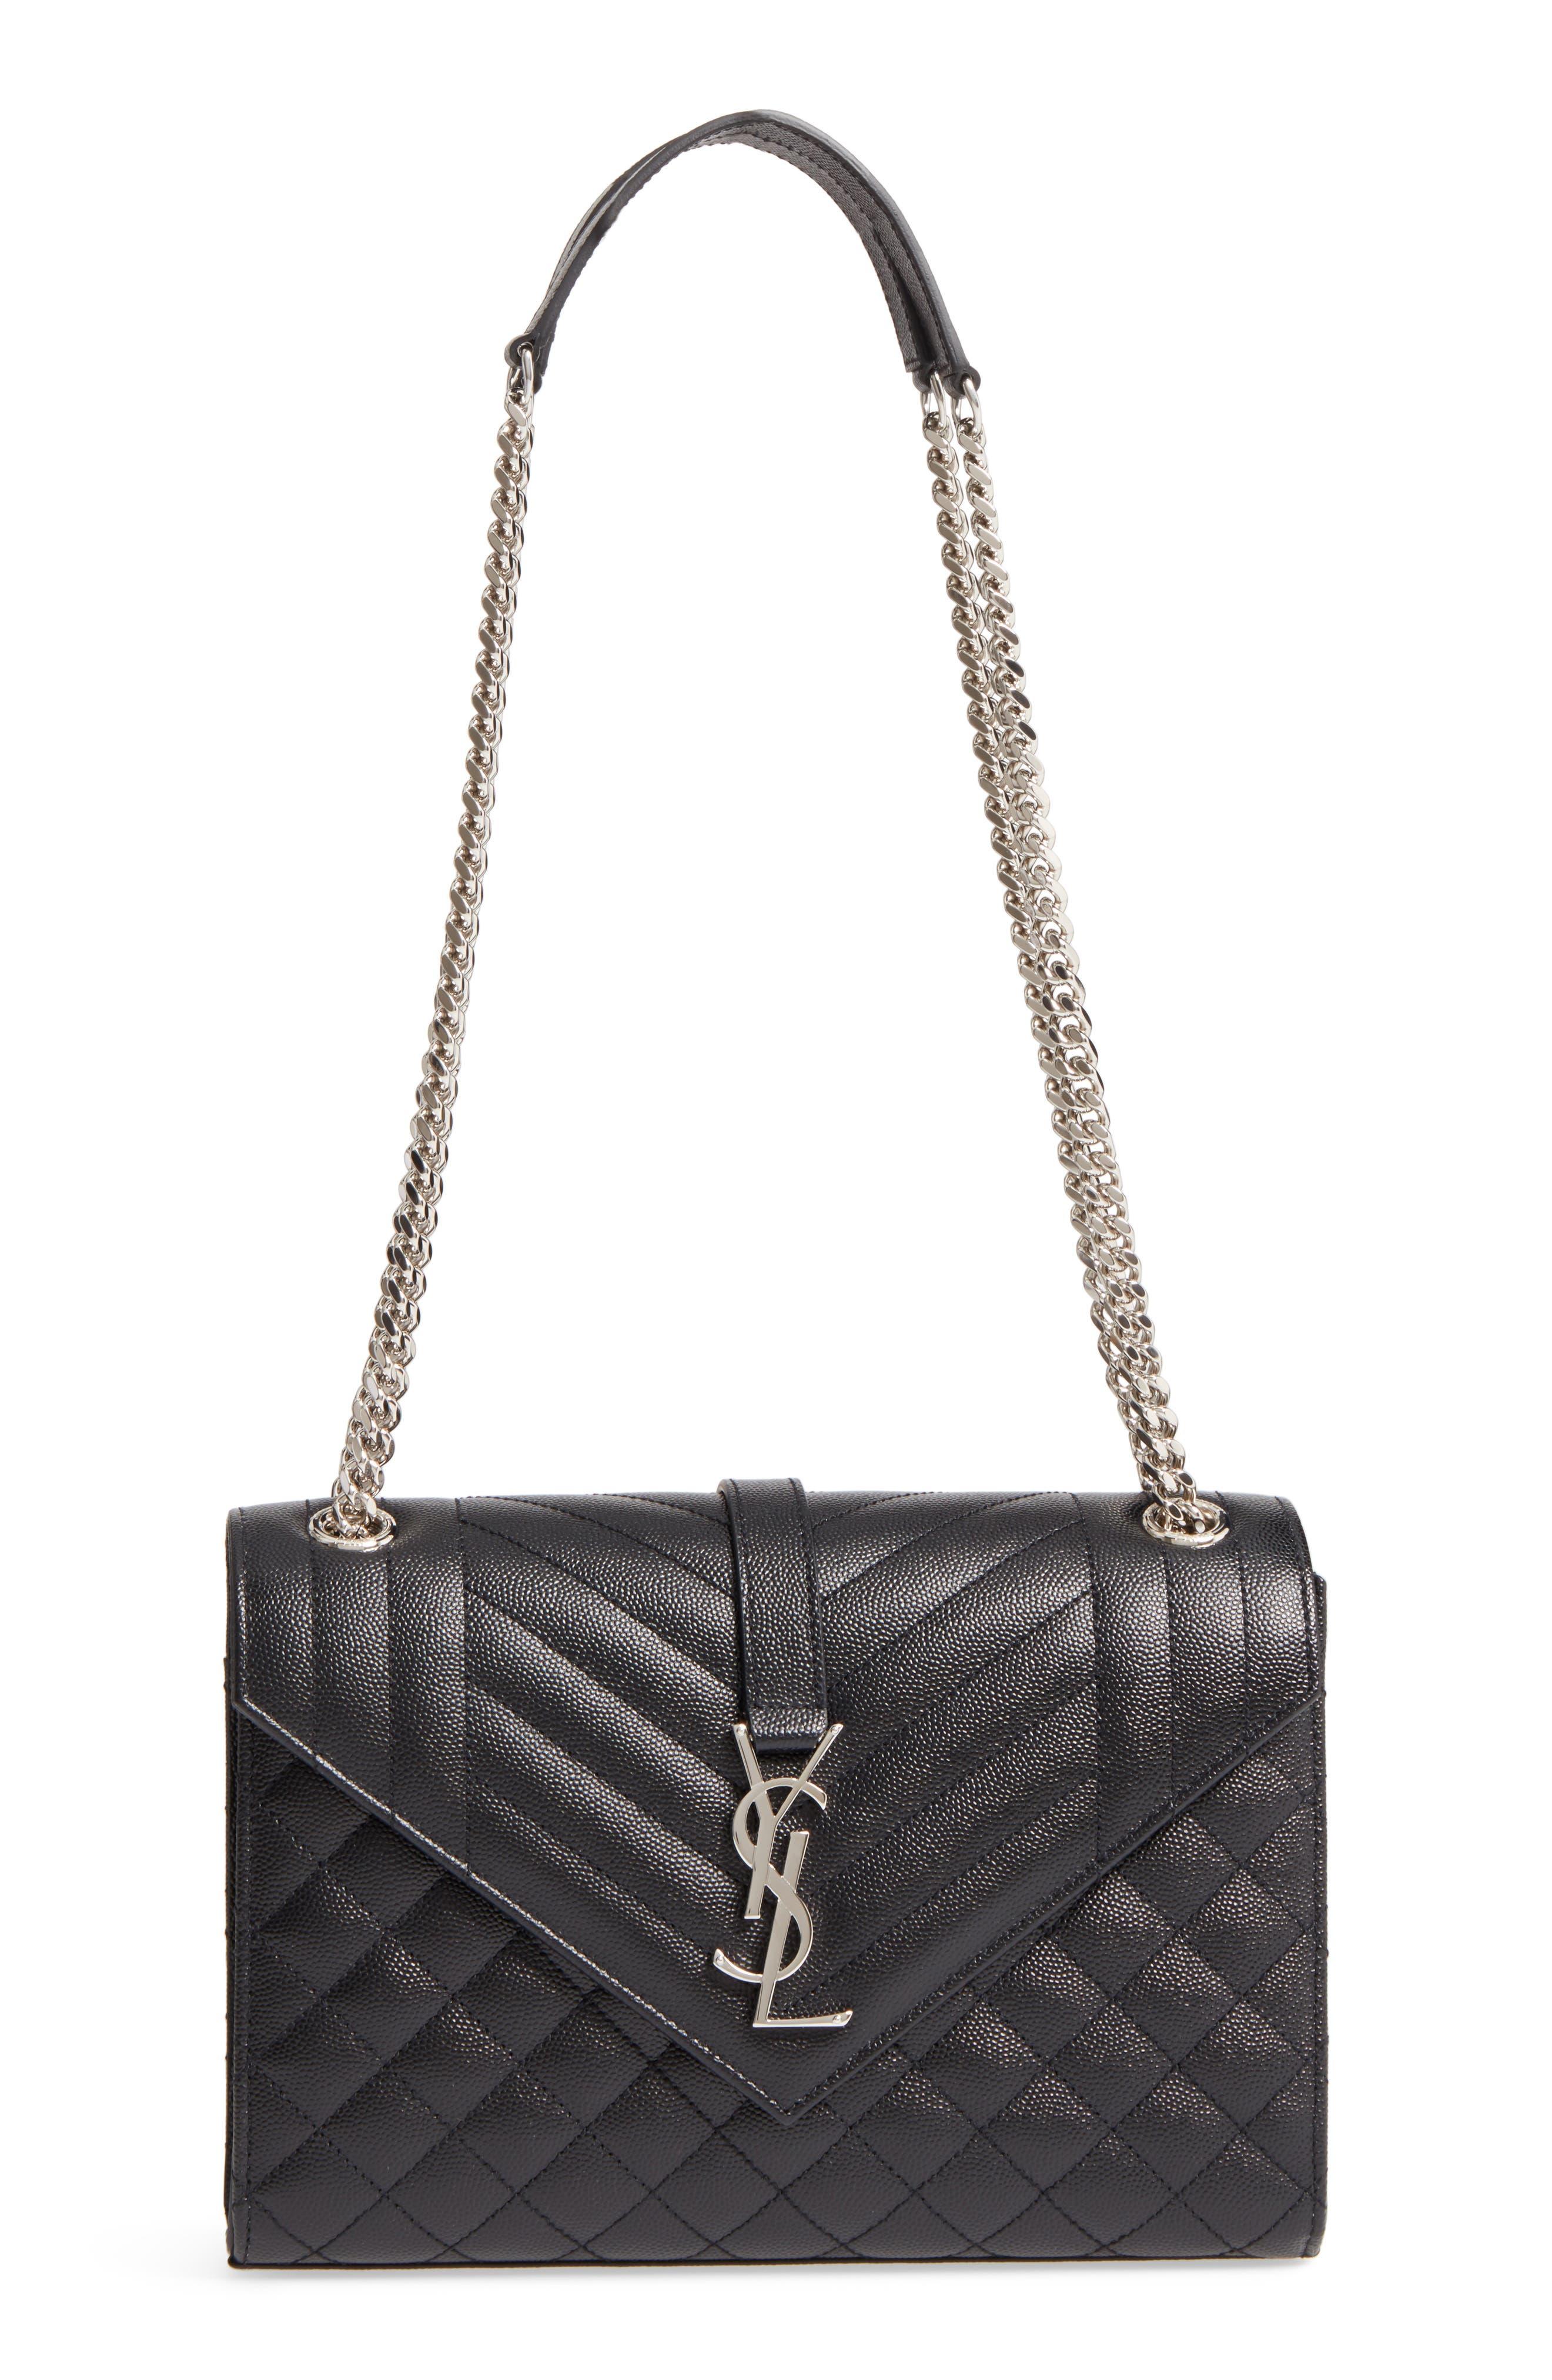 Medium Cassandra Calfskin Shoulder Bag,                             Main thumbnail 1, color,                             001